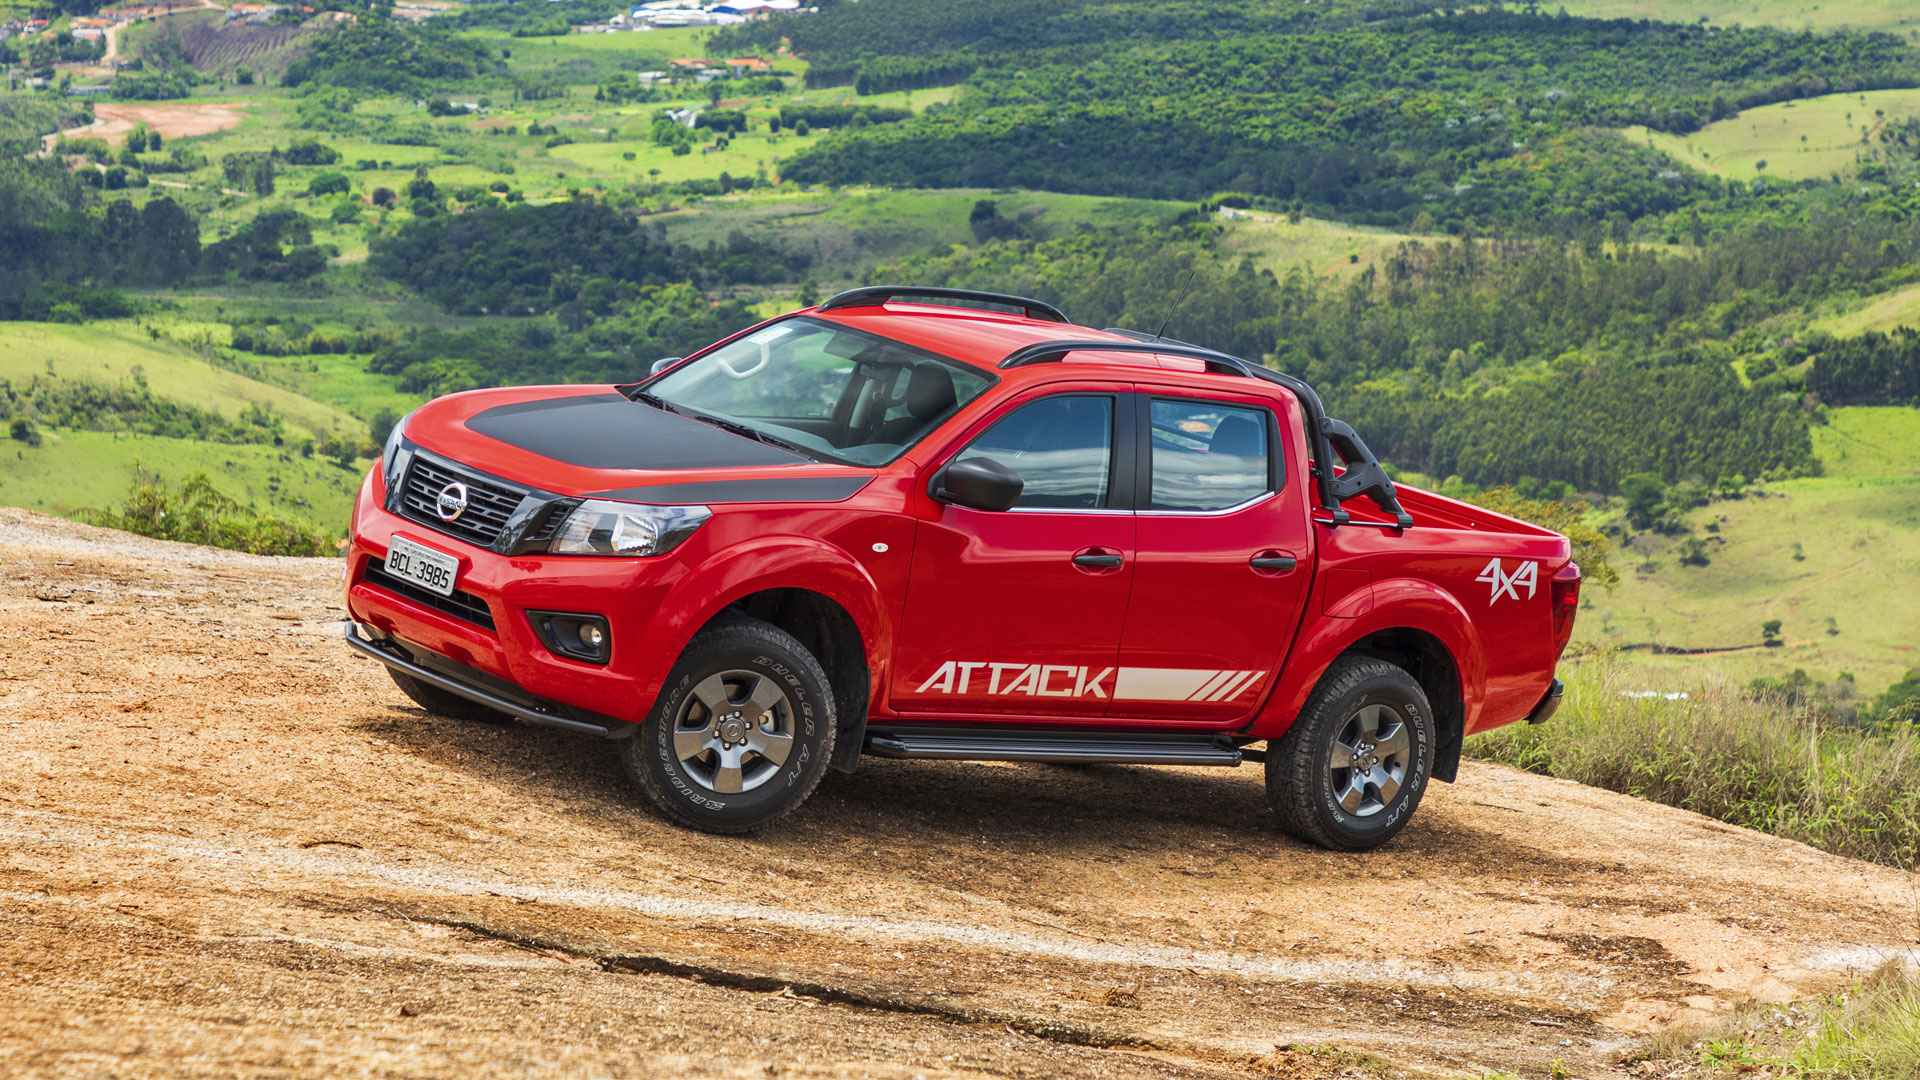 Teste Instrumentado Nissan Frontier Attack 2019 Lidera Ofensiva Da Picape